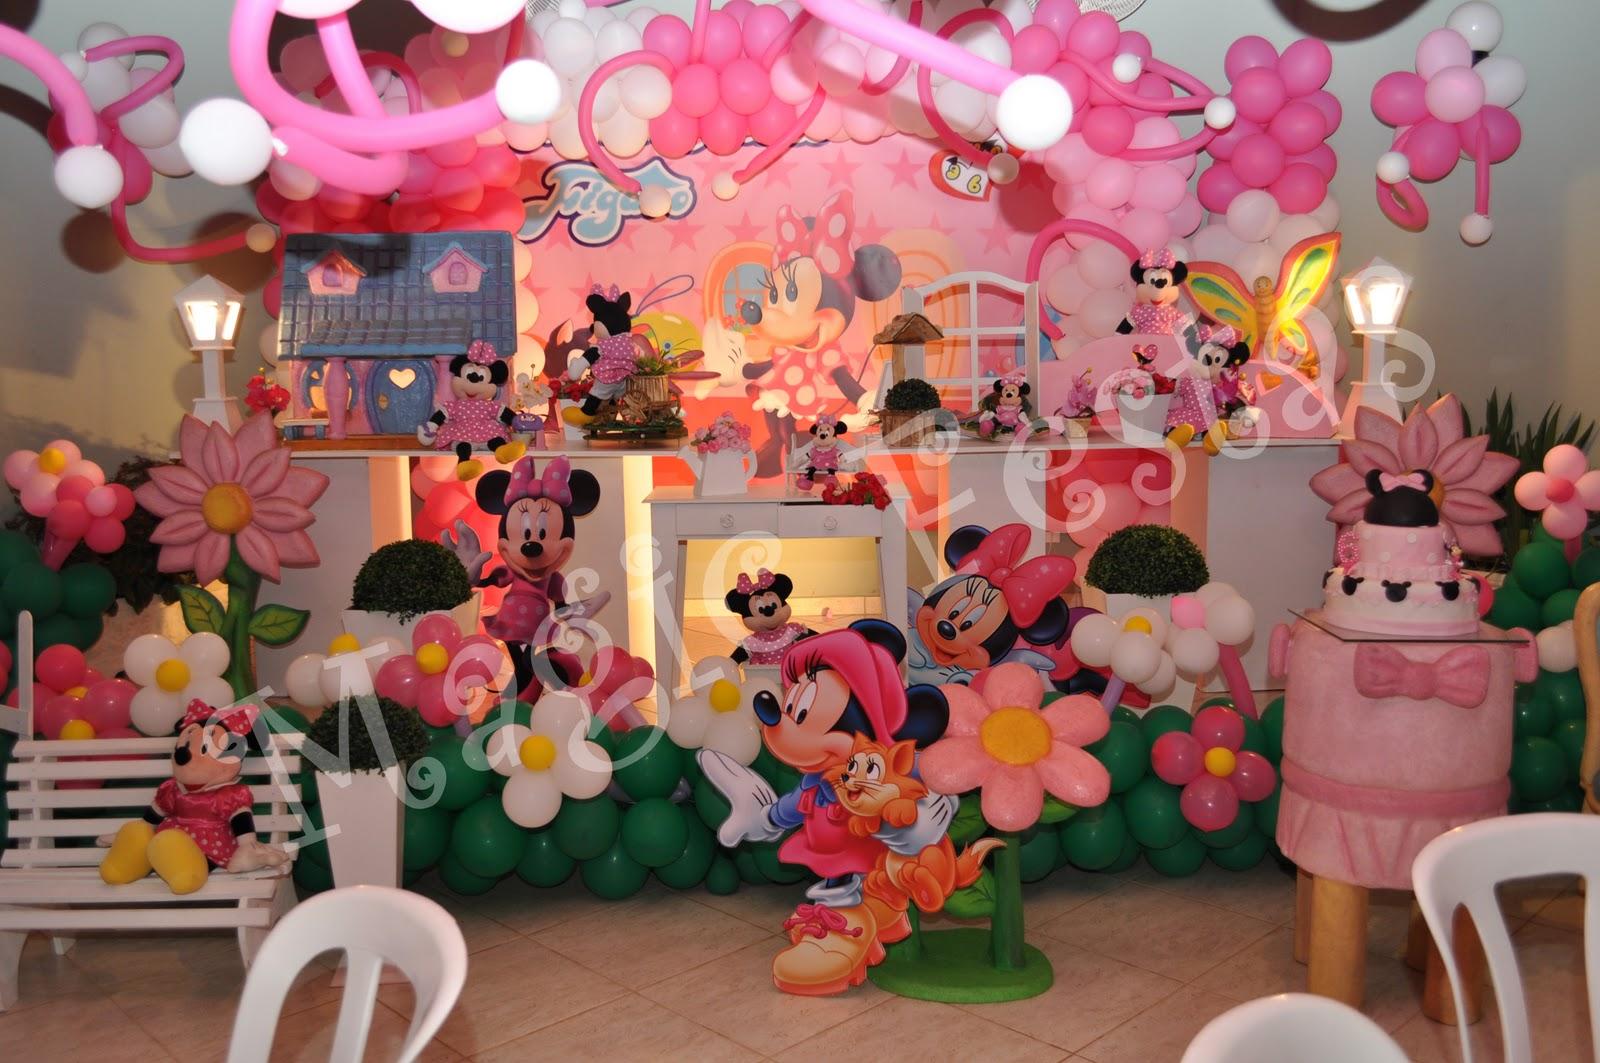 decoracao festa minnie rosa : decoracao festa minnie rosa:Duda festas: Festa Minnie rosa